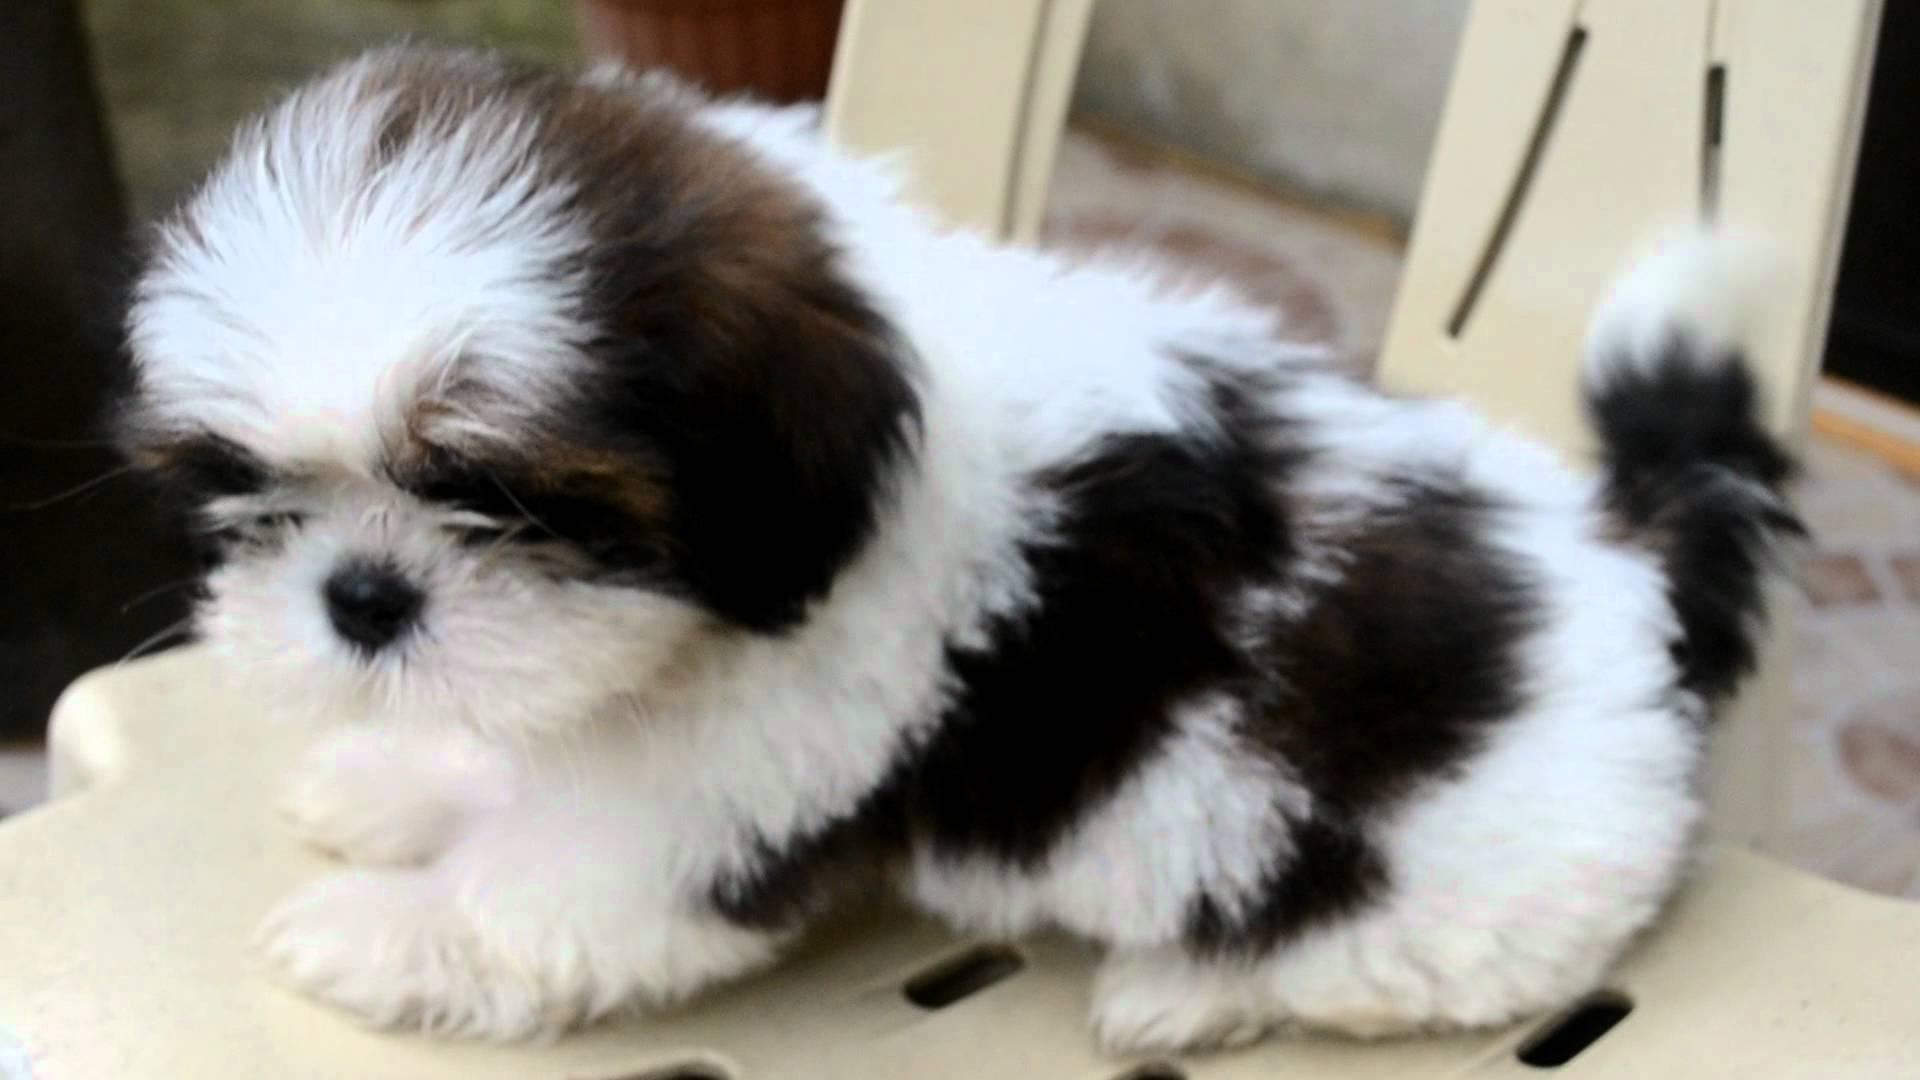 Shih Tzu Puppies Wallpapers Wallpaper Cave